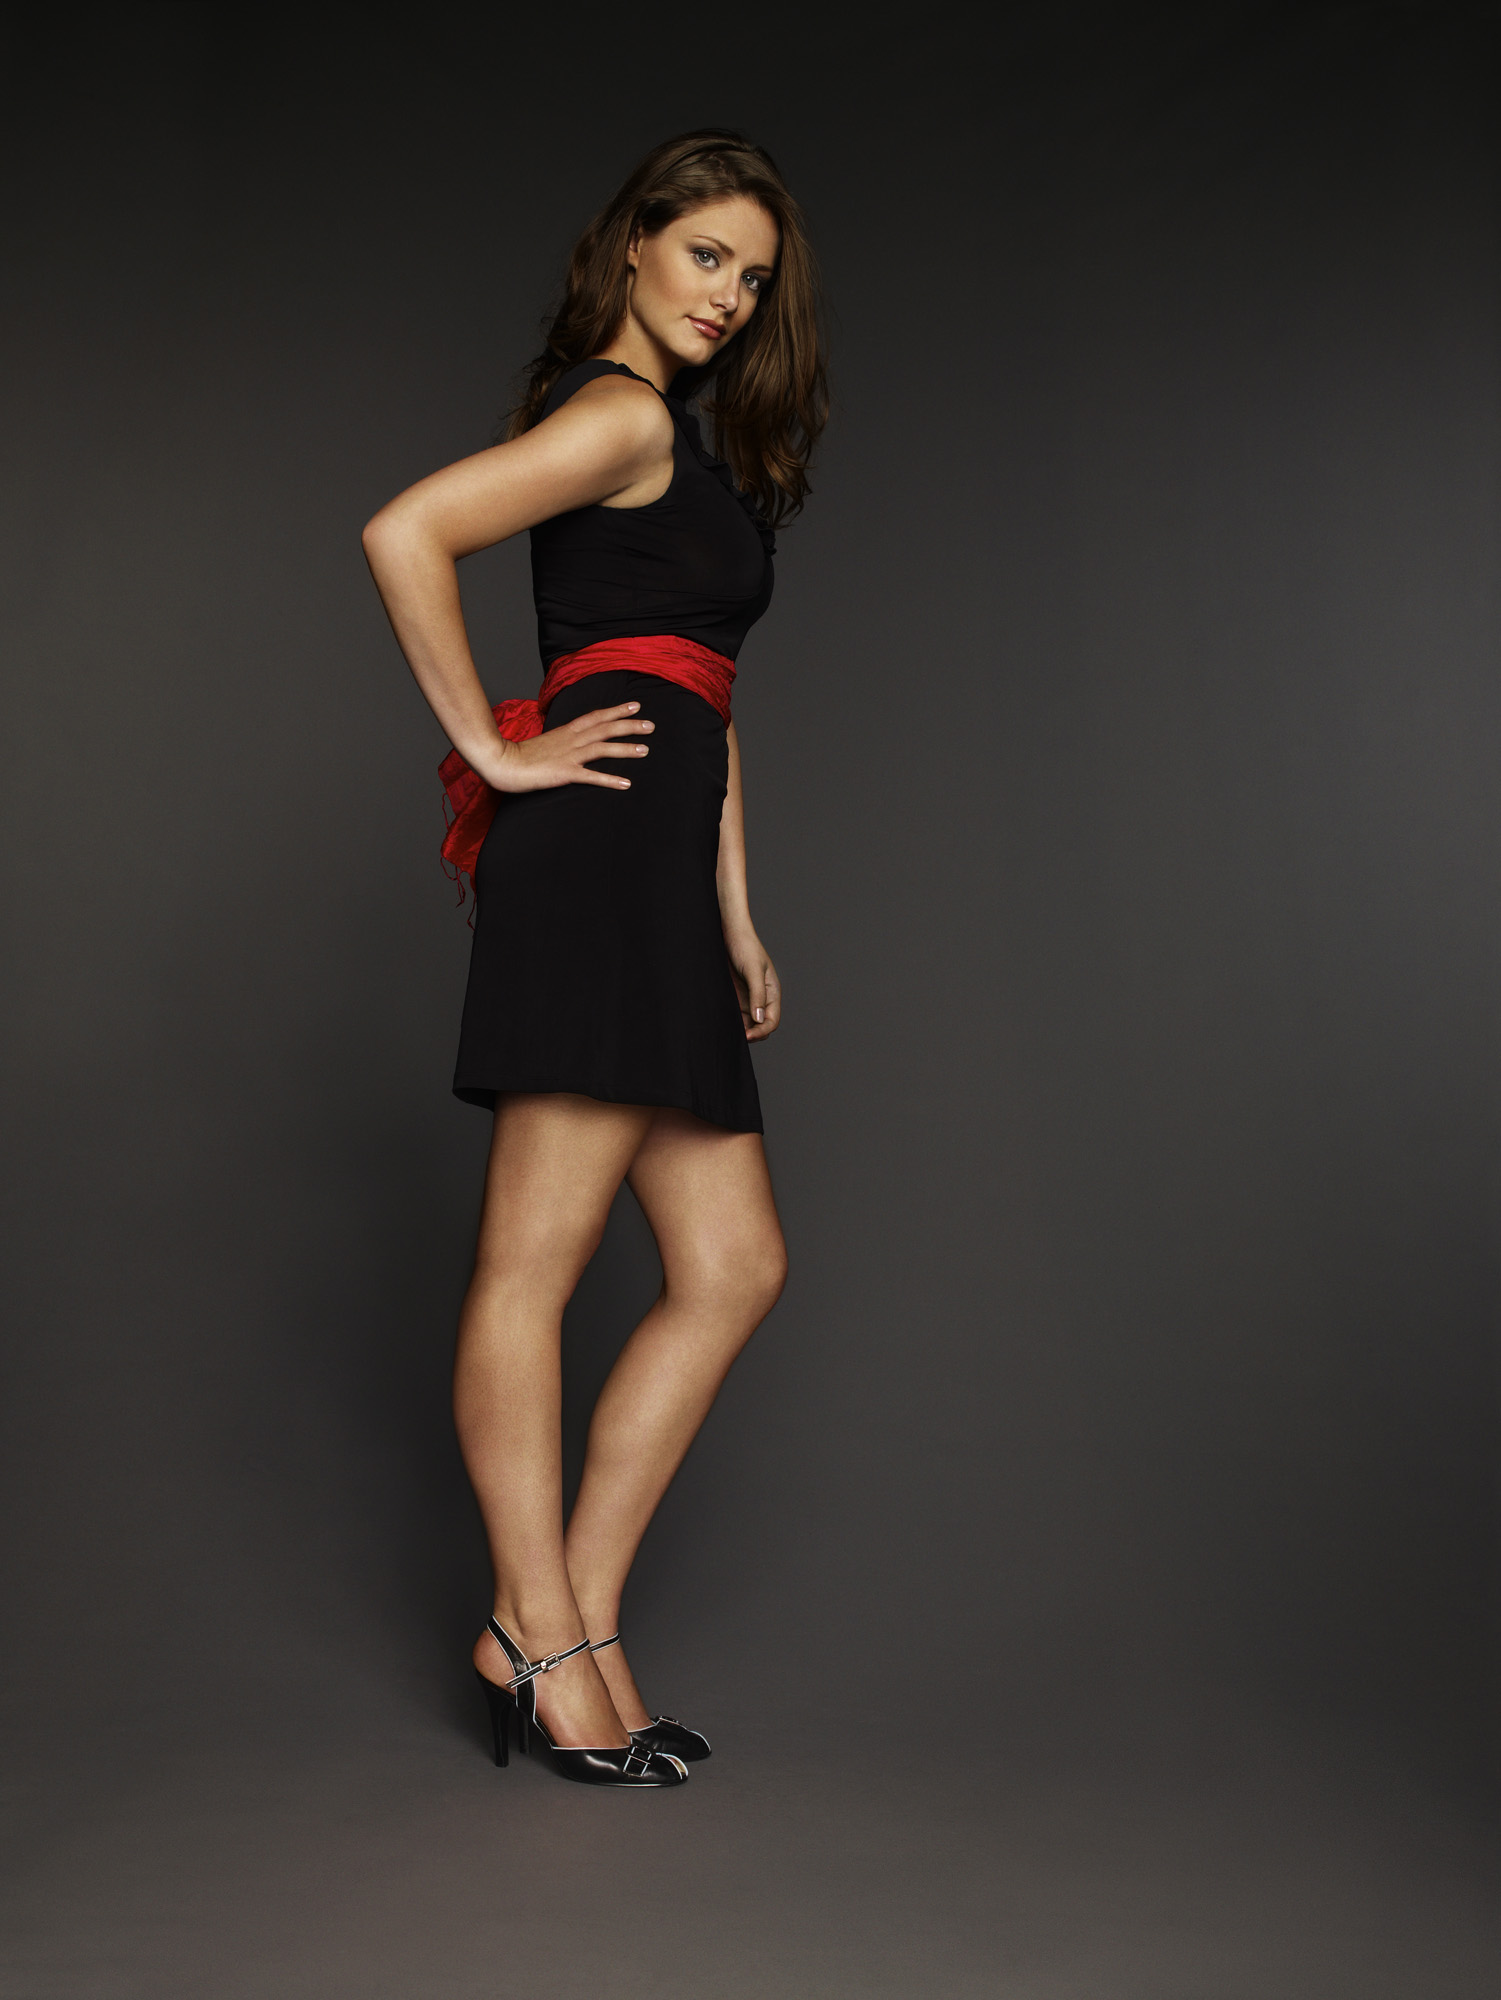 Sarah hartshrone photos of america 39 s next top model for Ameticas best